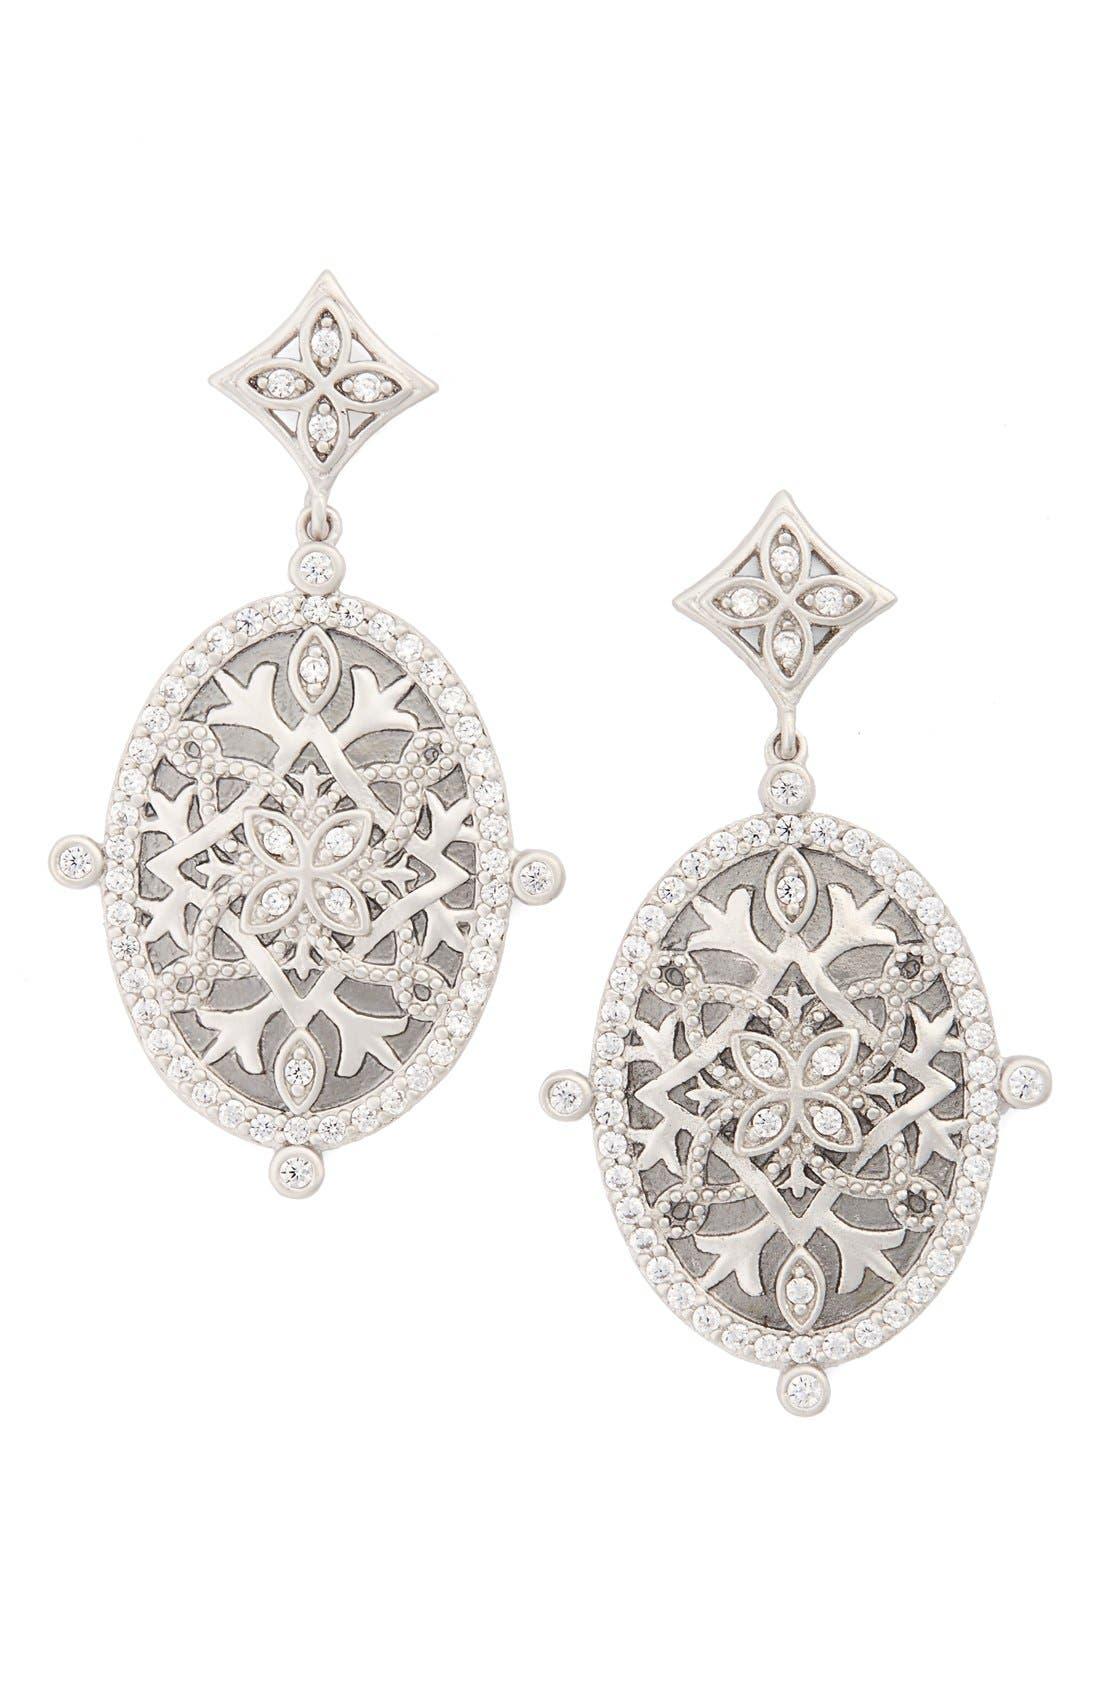 Contemporary Deco Drop Earrings,                         Main,                         color, Silver/ Gunmetal